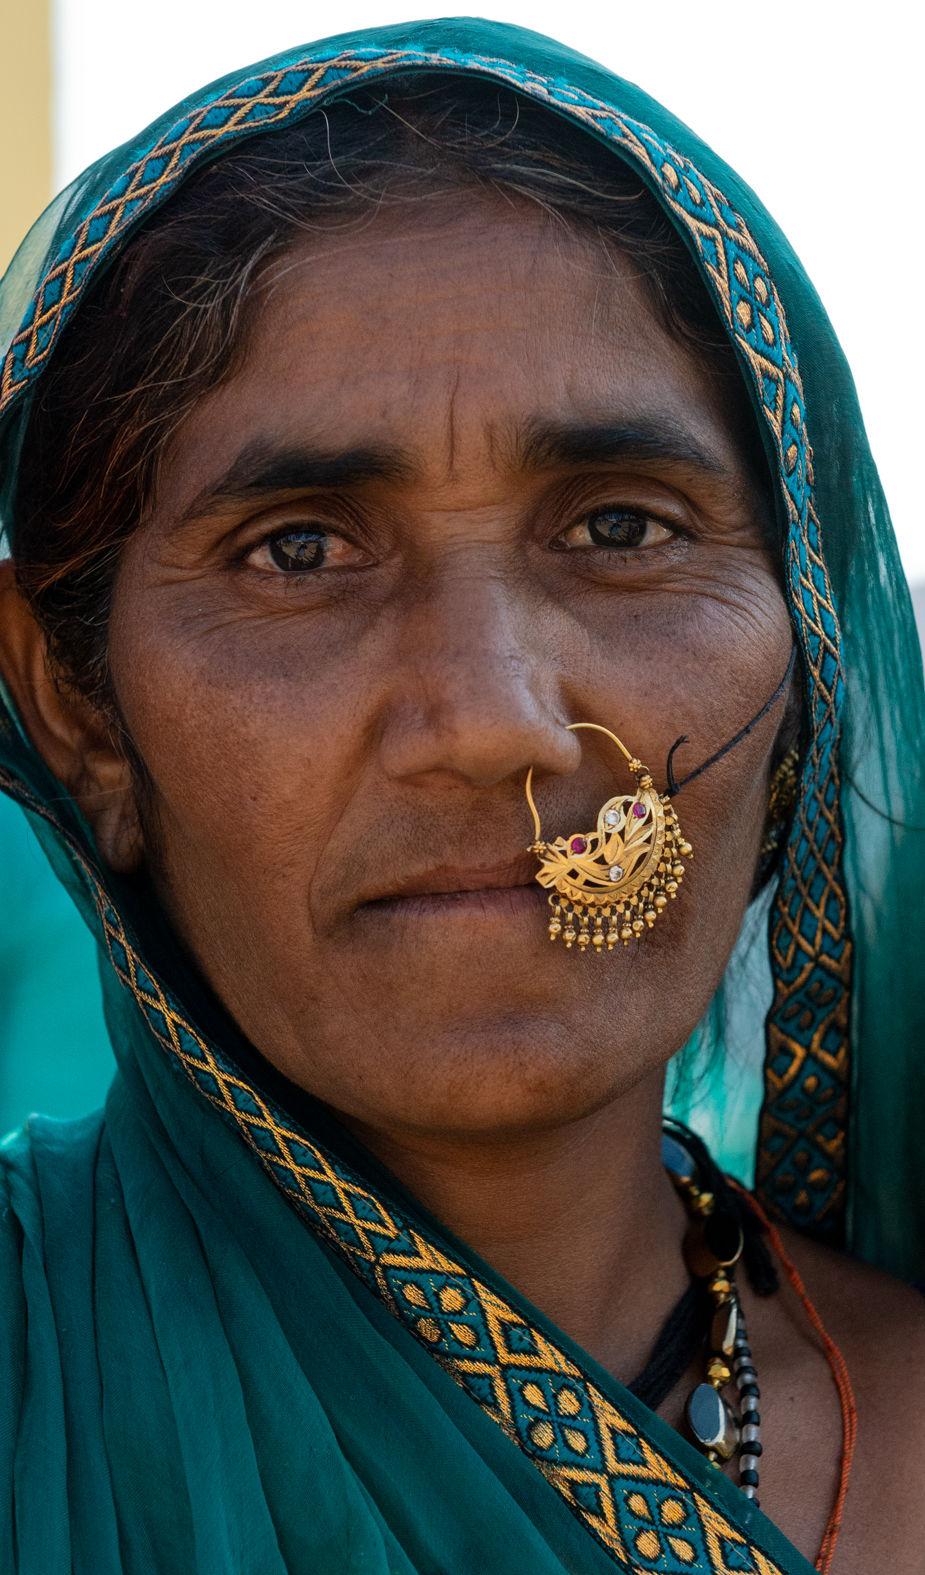 Lady wearing gold jewellery, Shahpura, Rajasthan